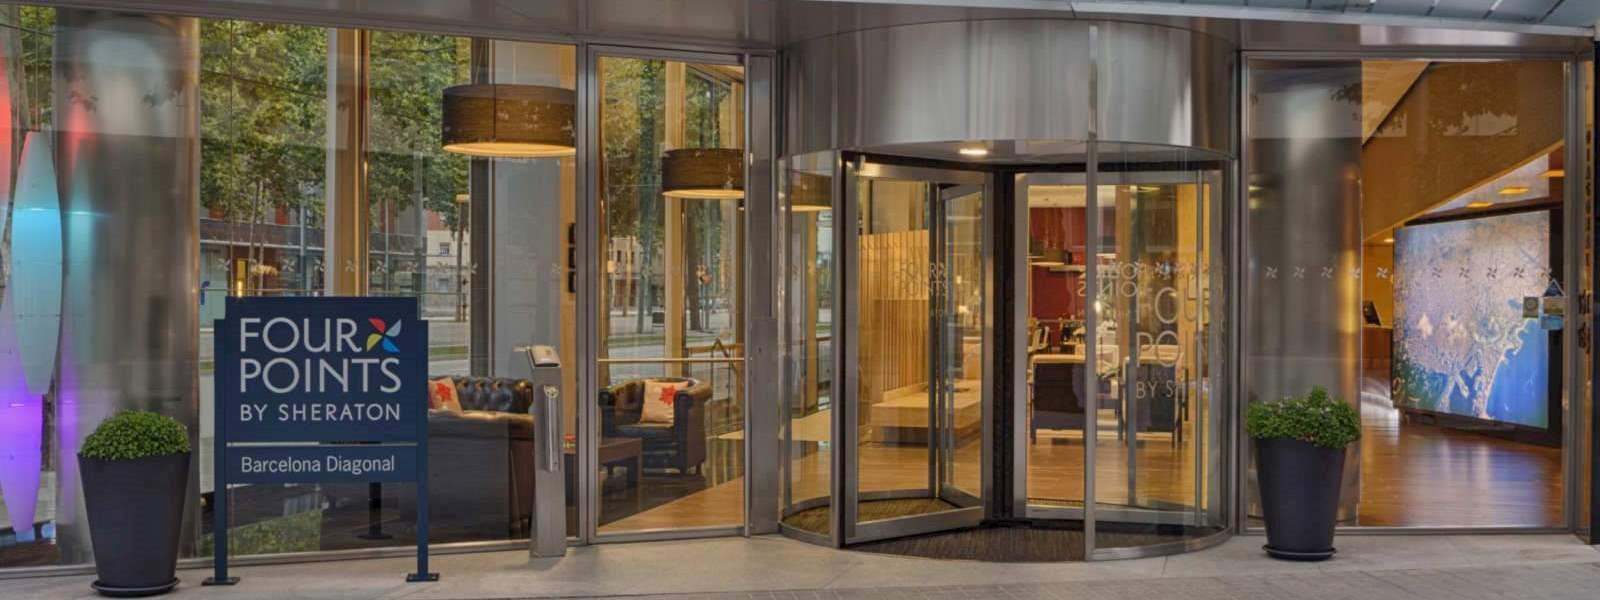 Lobby   Four Points by Sheraton Barcelona Diagonal